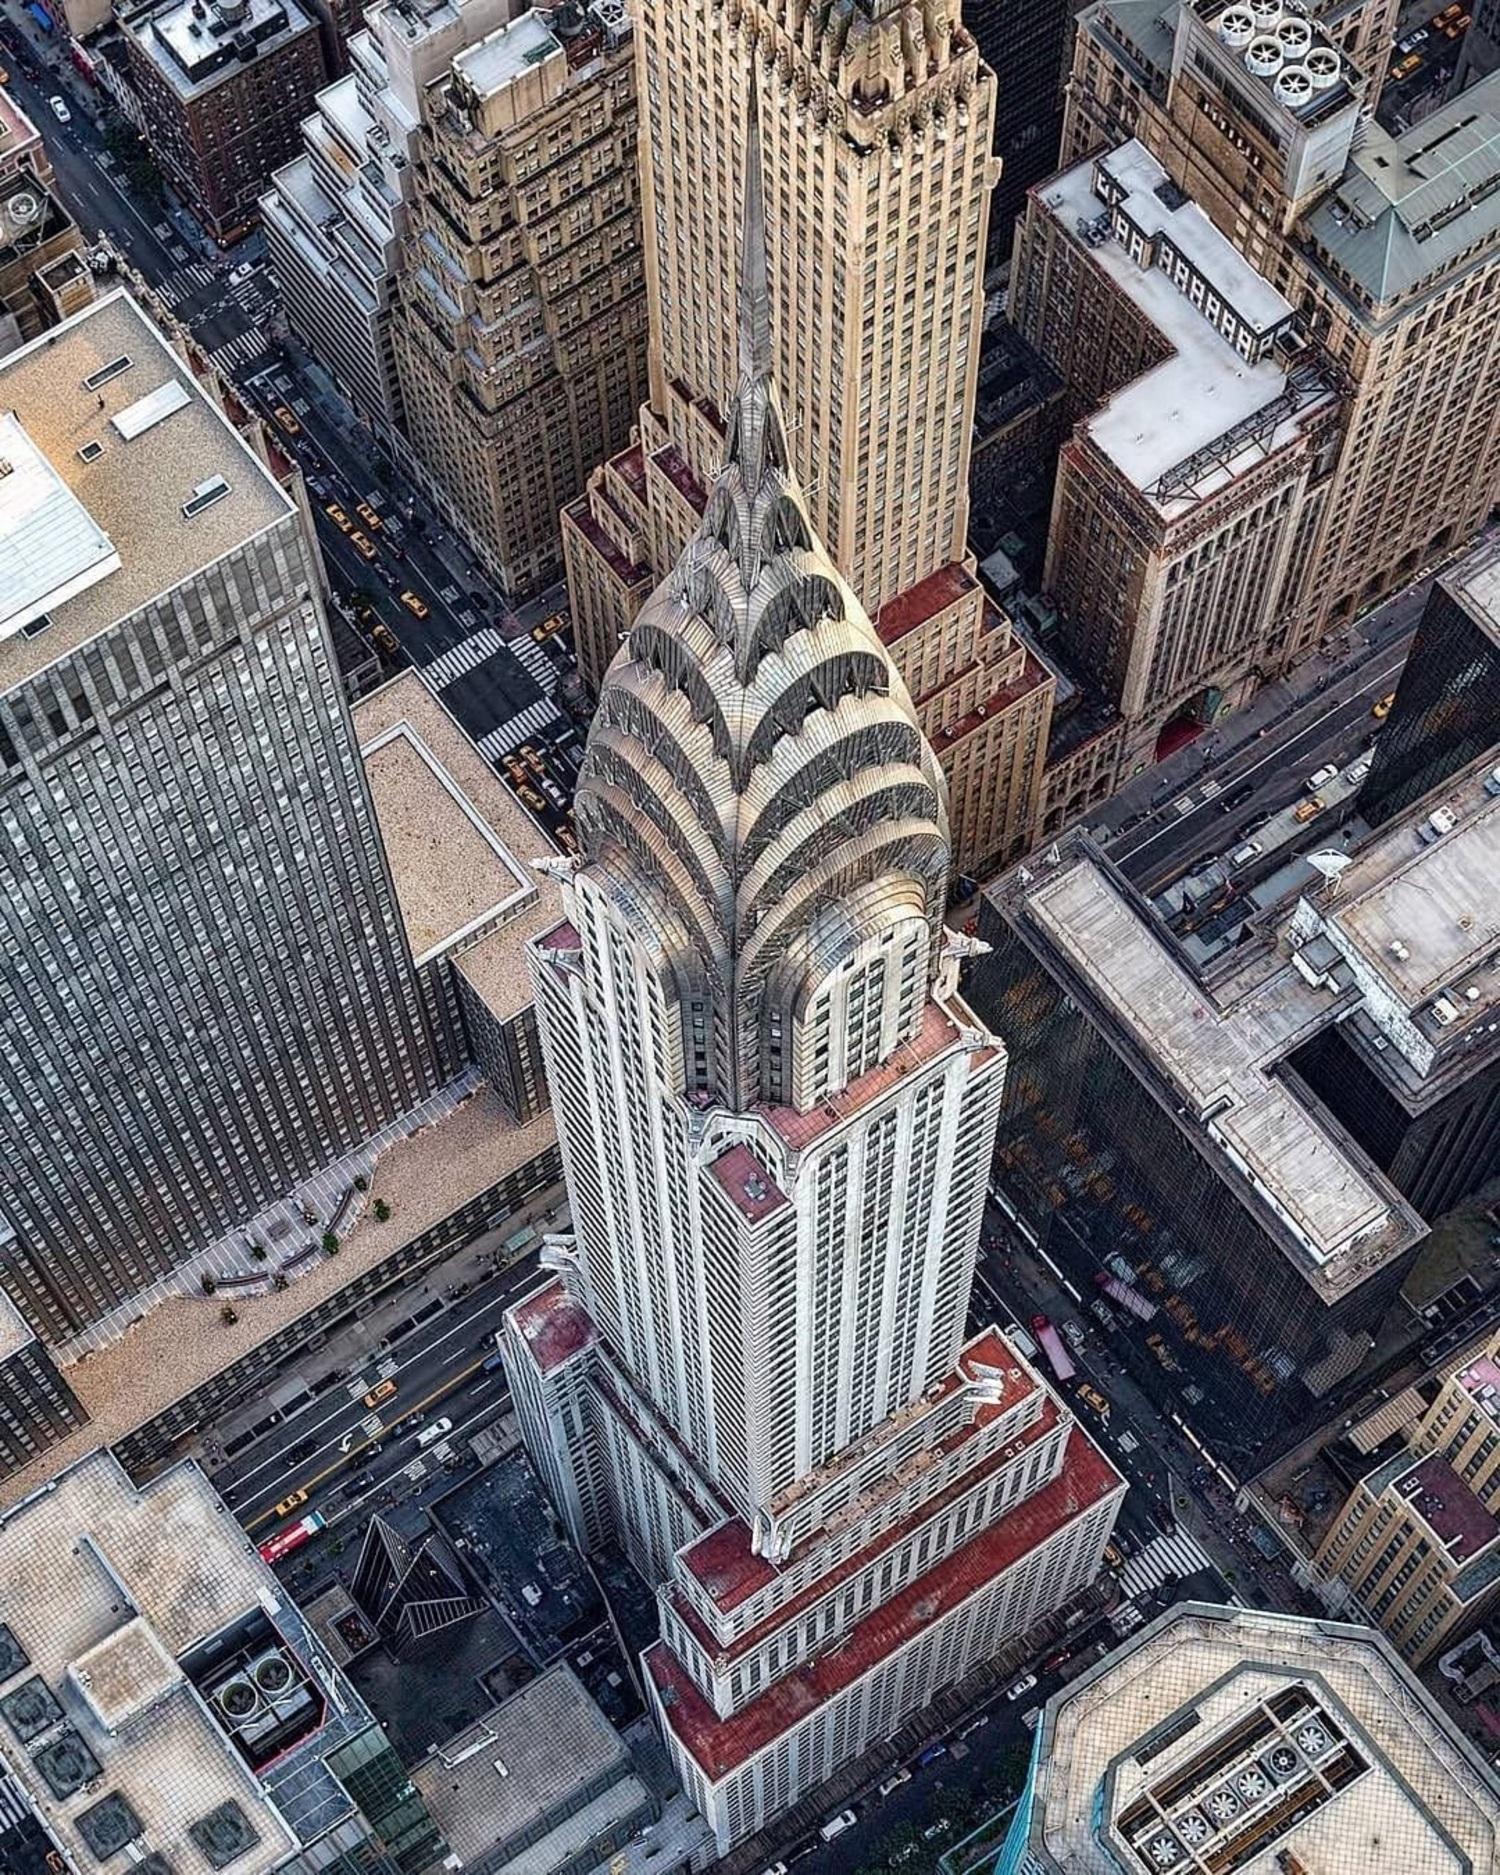 Chrysler Building, Manhattan. Photo via @mattpugs #viewingnyc #nyc #newyork #newyorkcity #chryslerbuilding